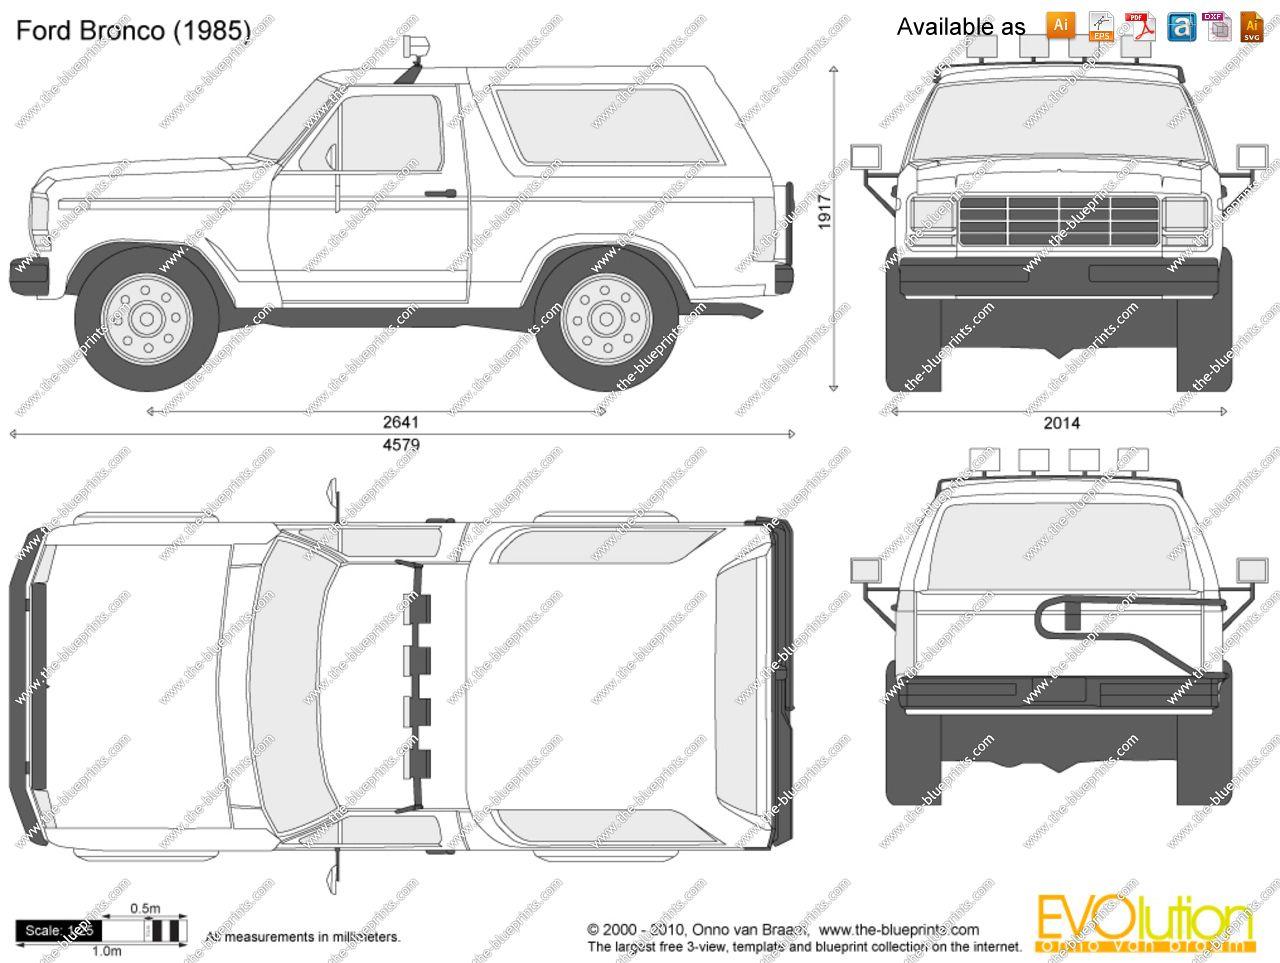 Ford Bronco Blueprints